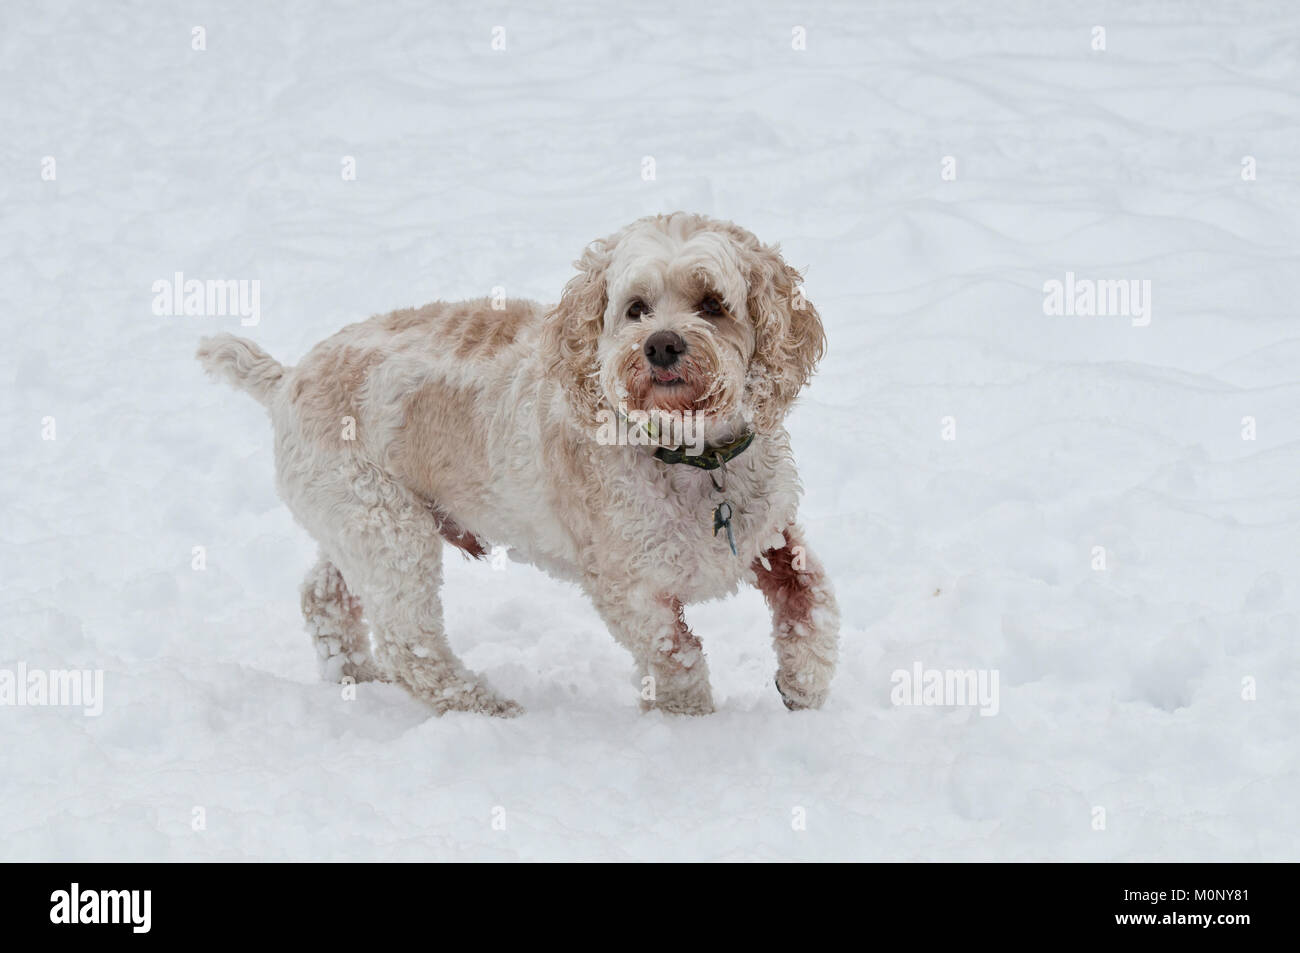 Cockapoo in snow - Stock Image